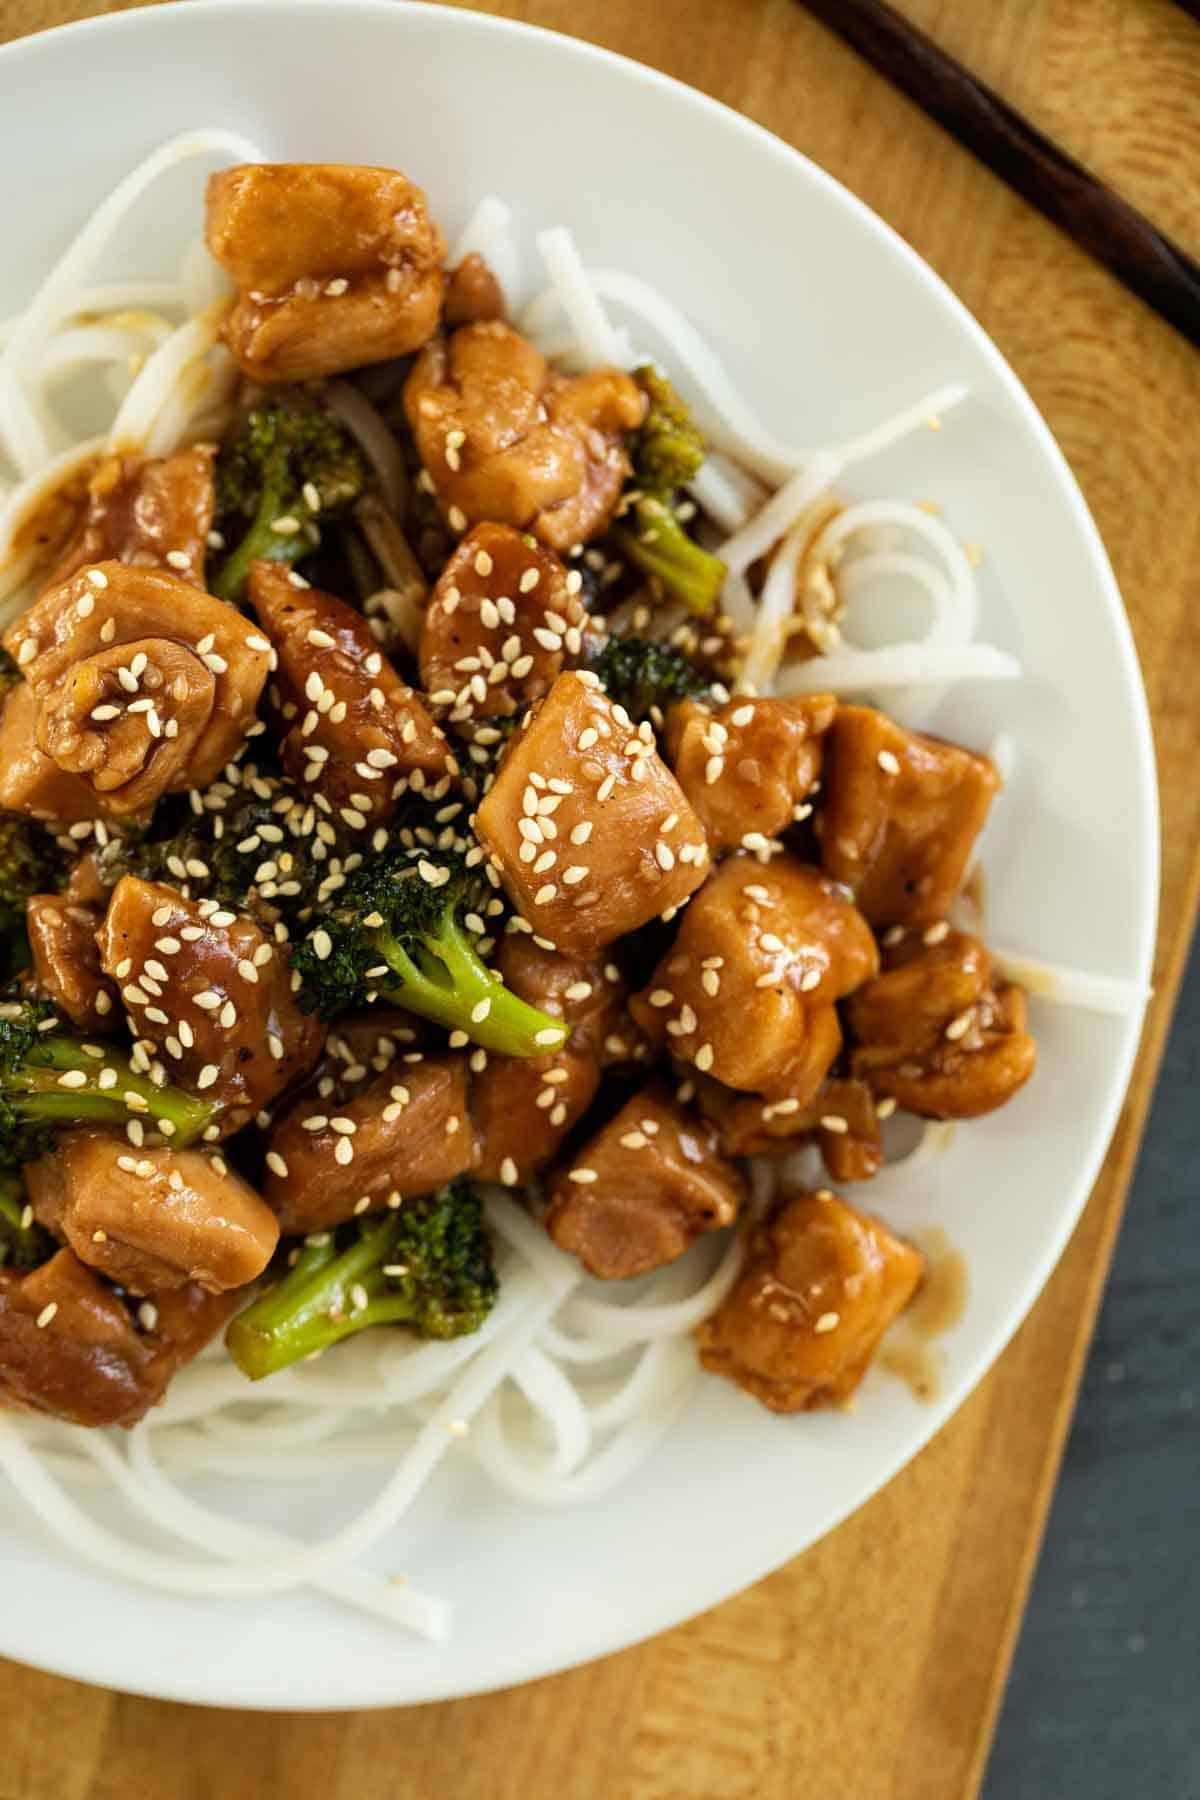 Stir Fry Sesame Chicken With Broccoli Taste And Tell